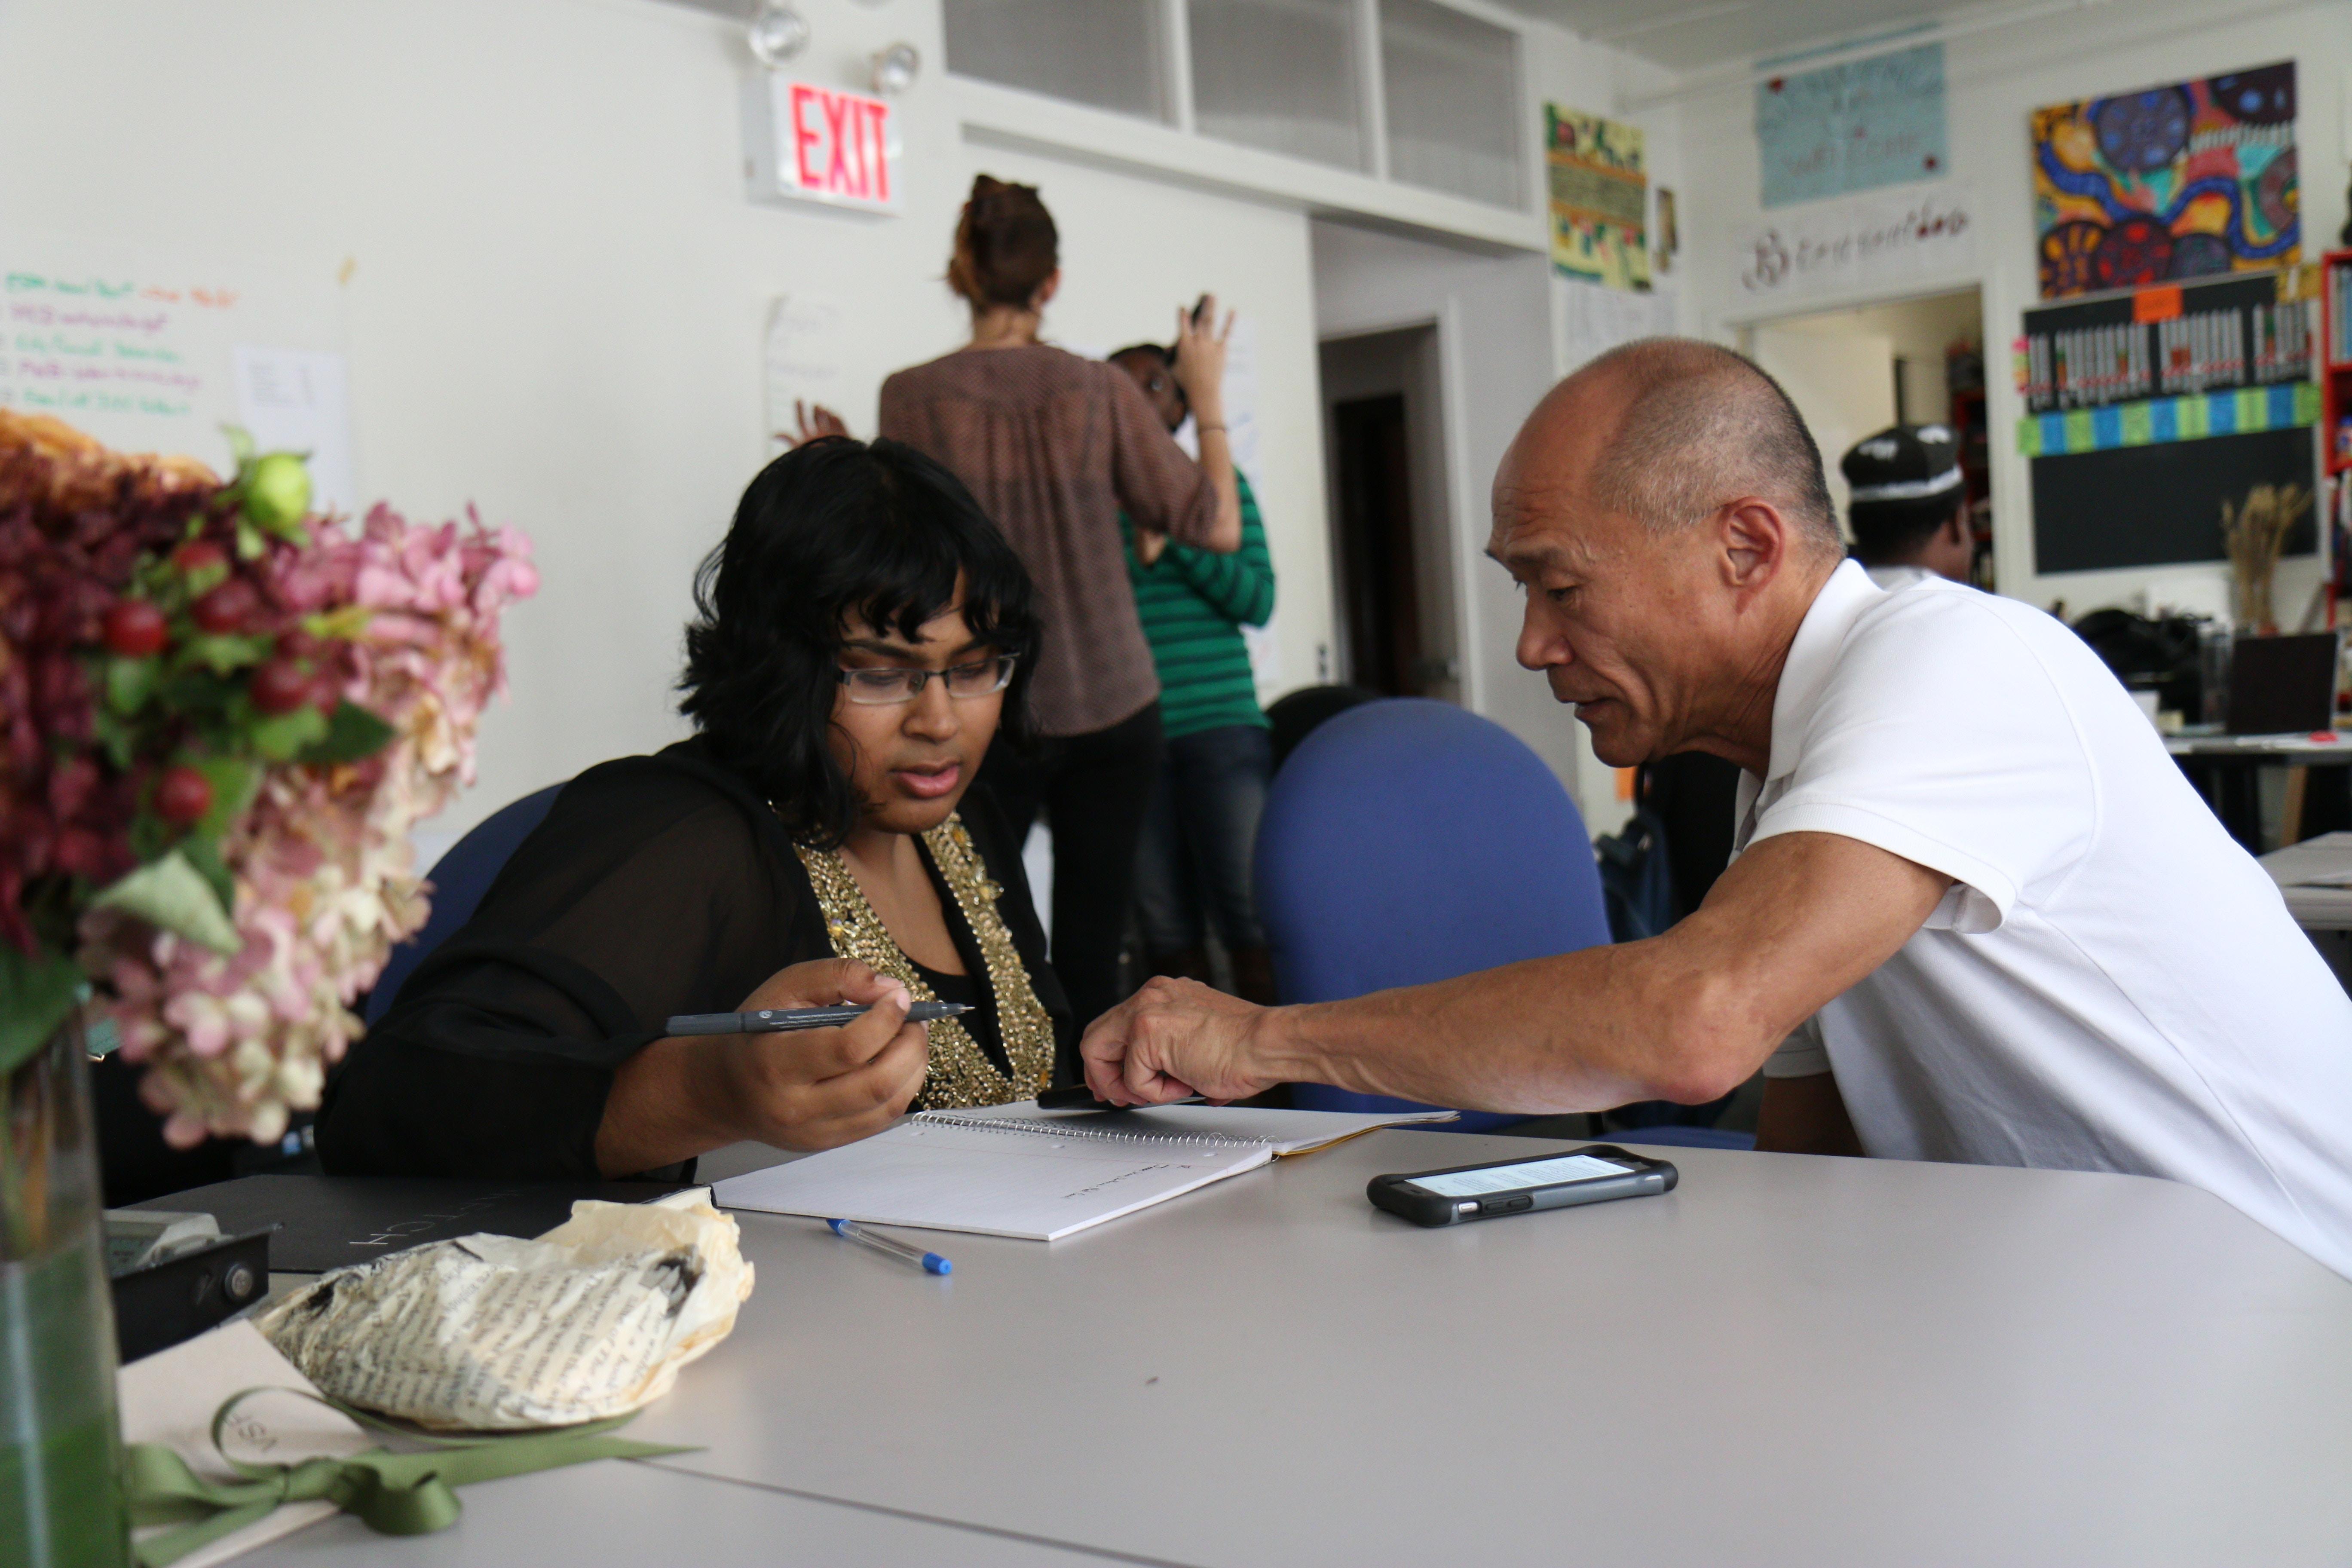 AltCap offers continuing education to entrepreneurs